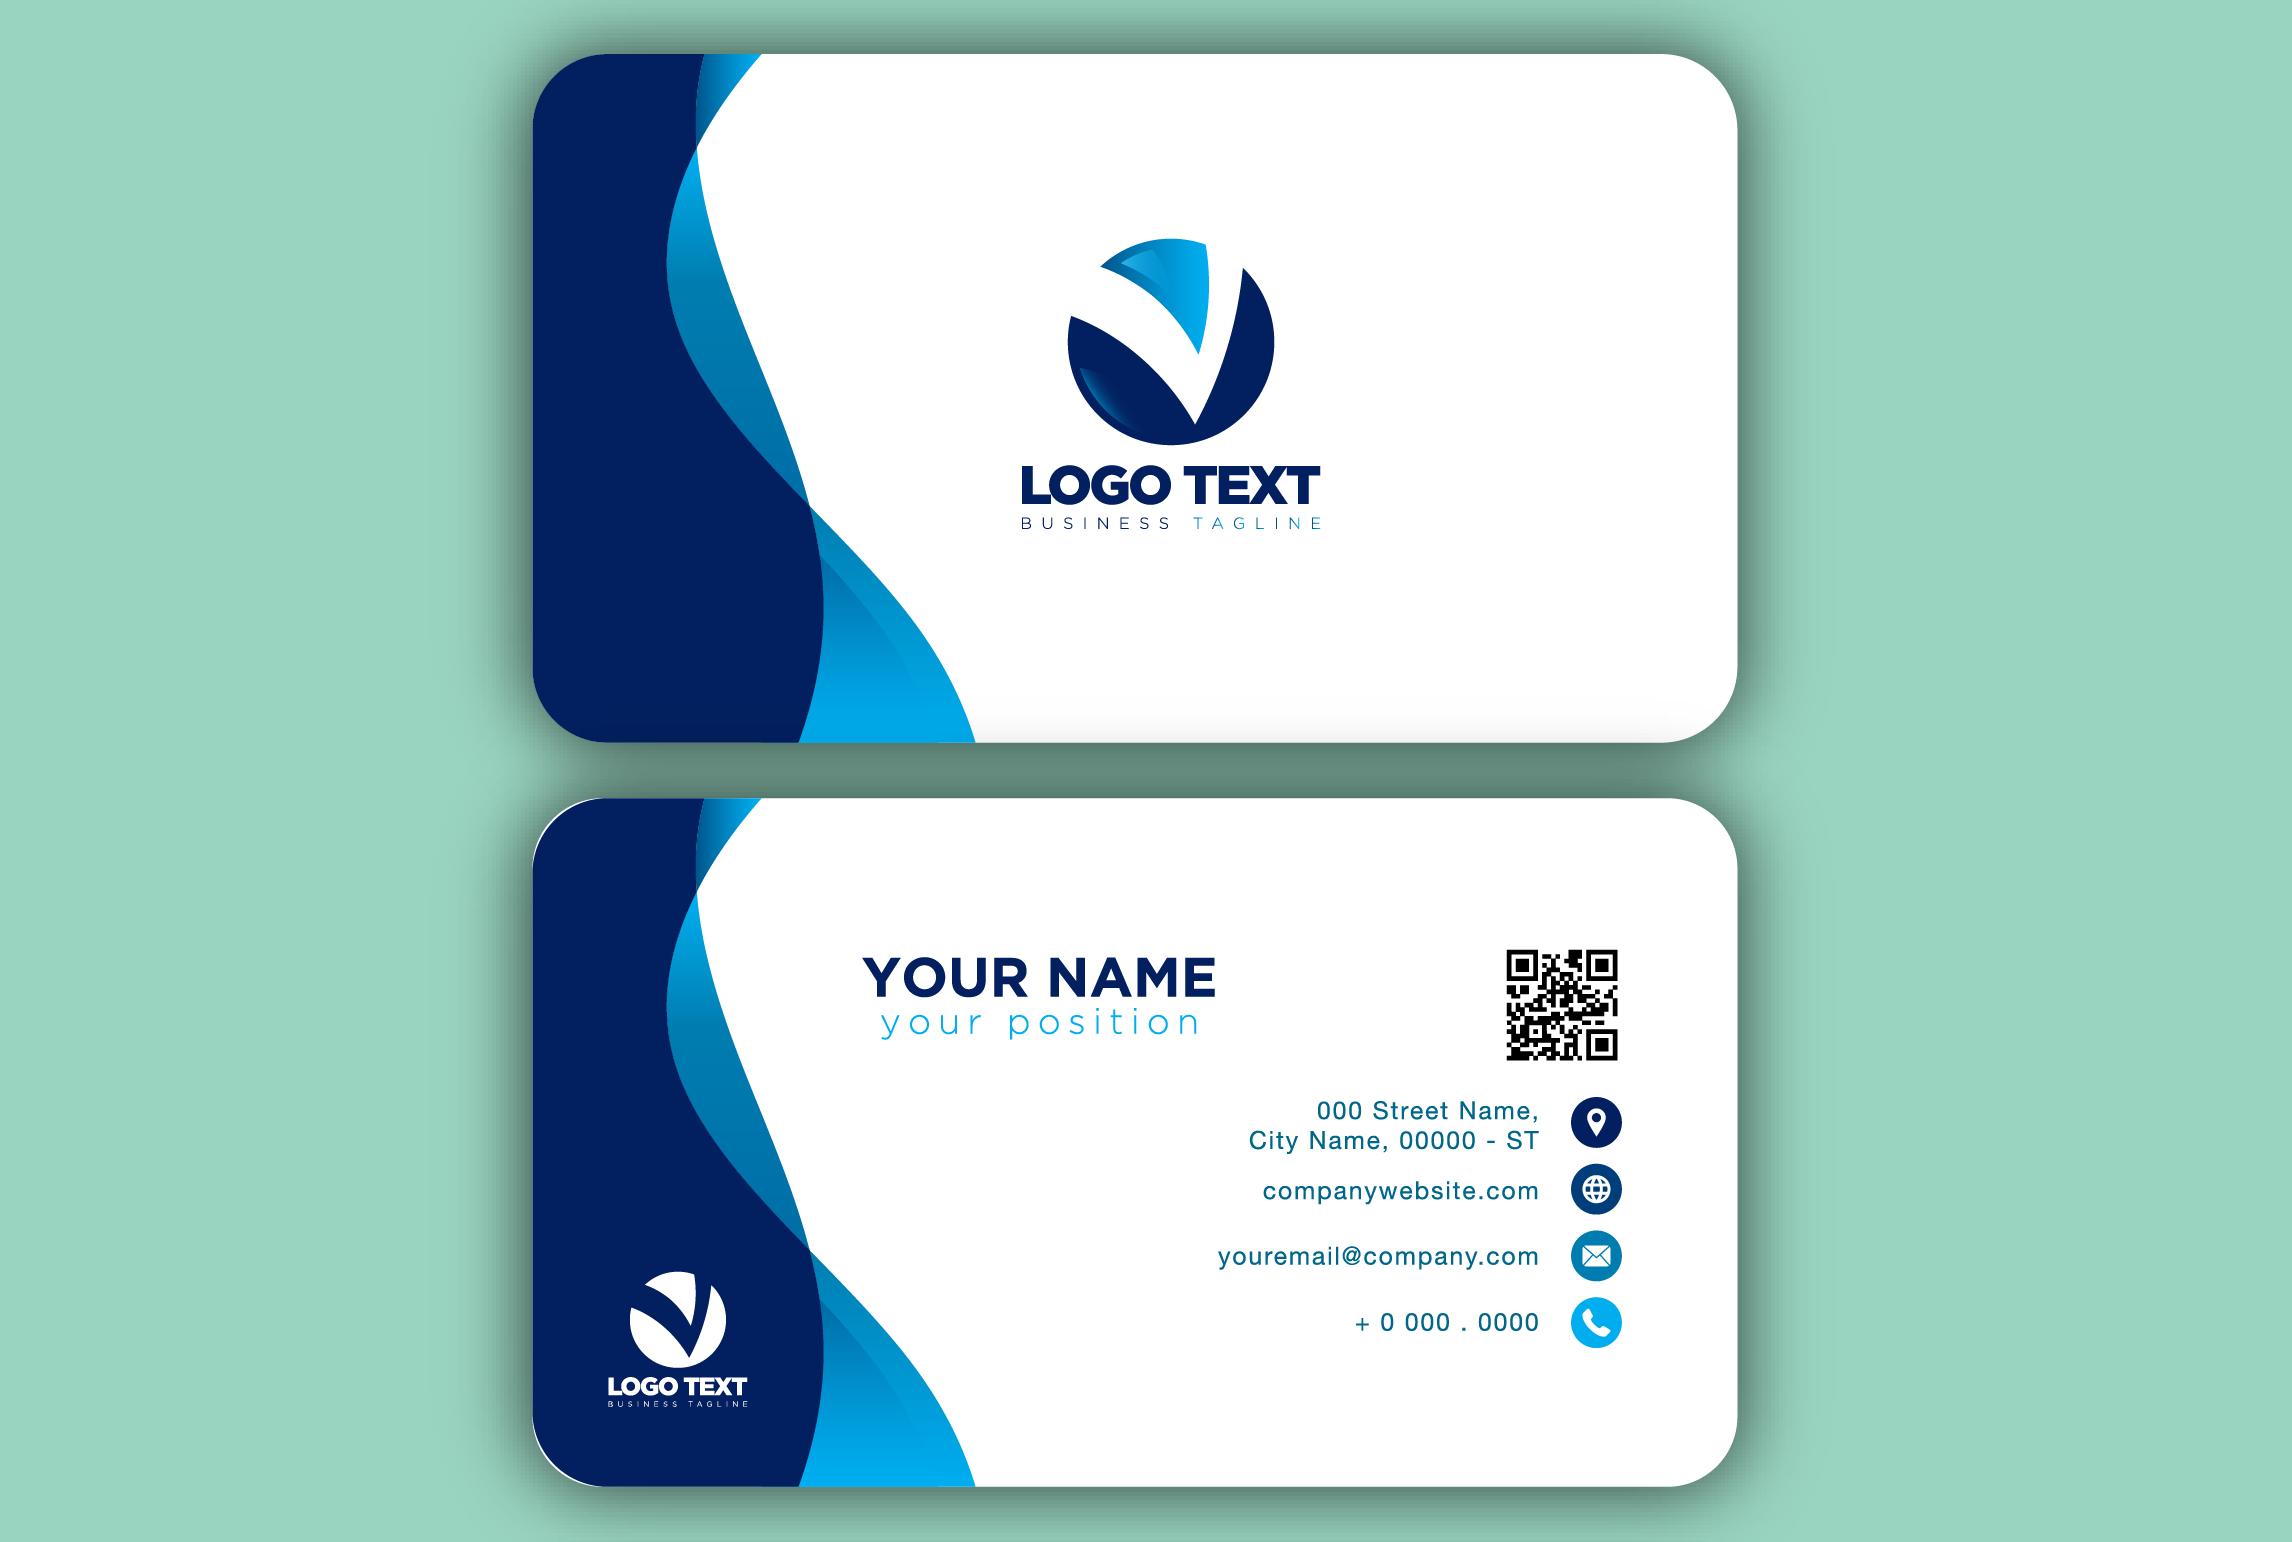 I will create a better design & business card.